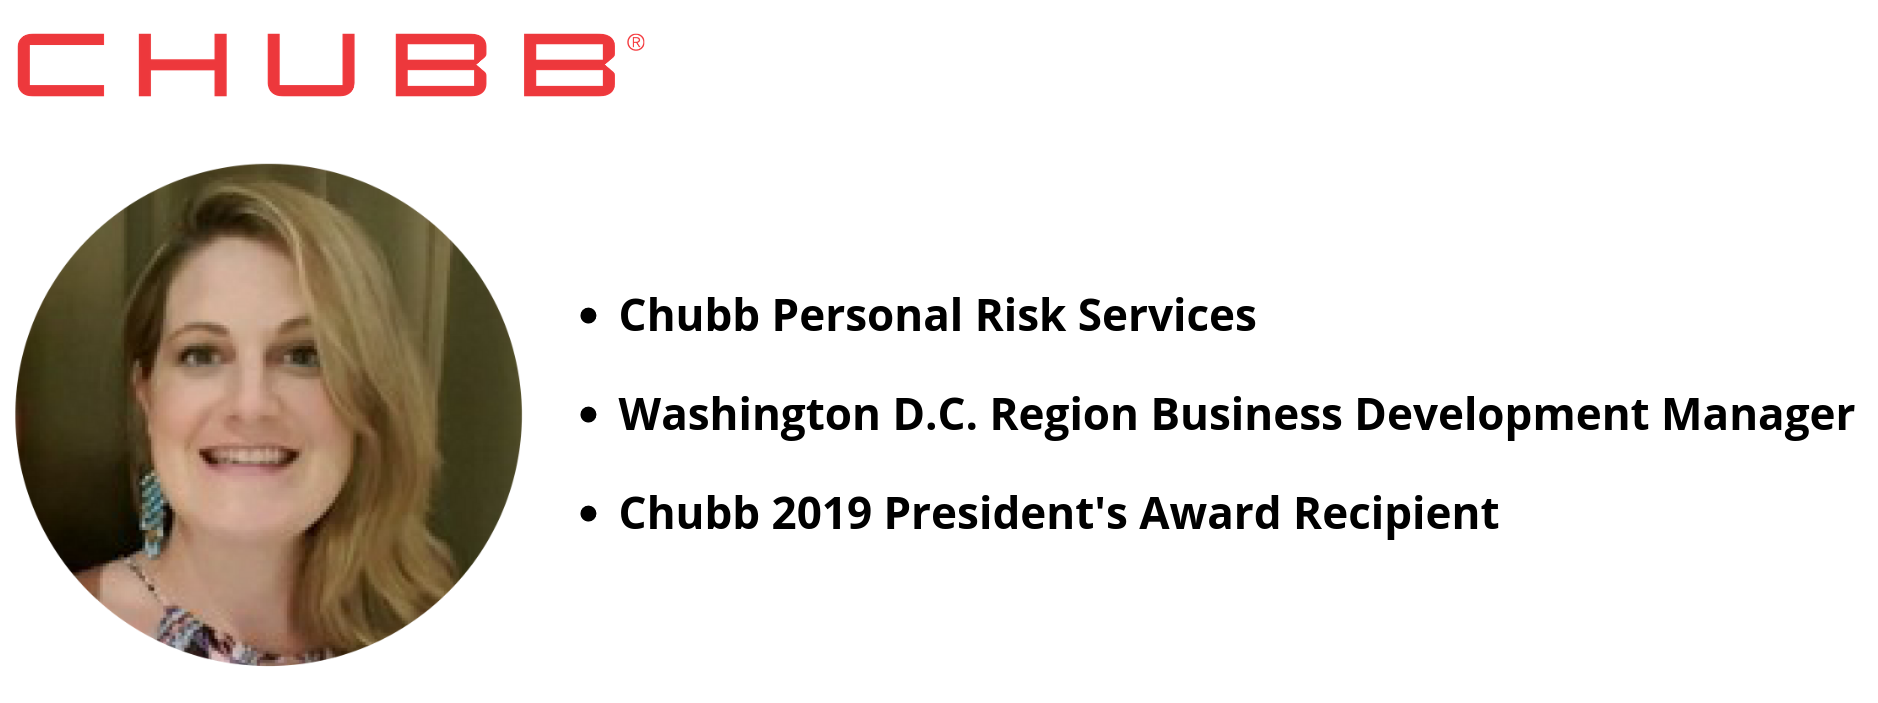 Chubb Personal Risk Services Washington D-C- Region (2)